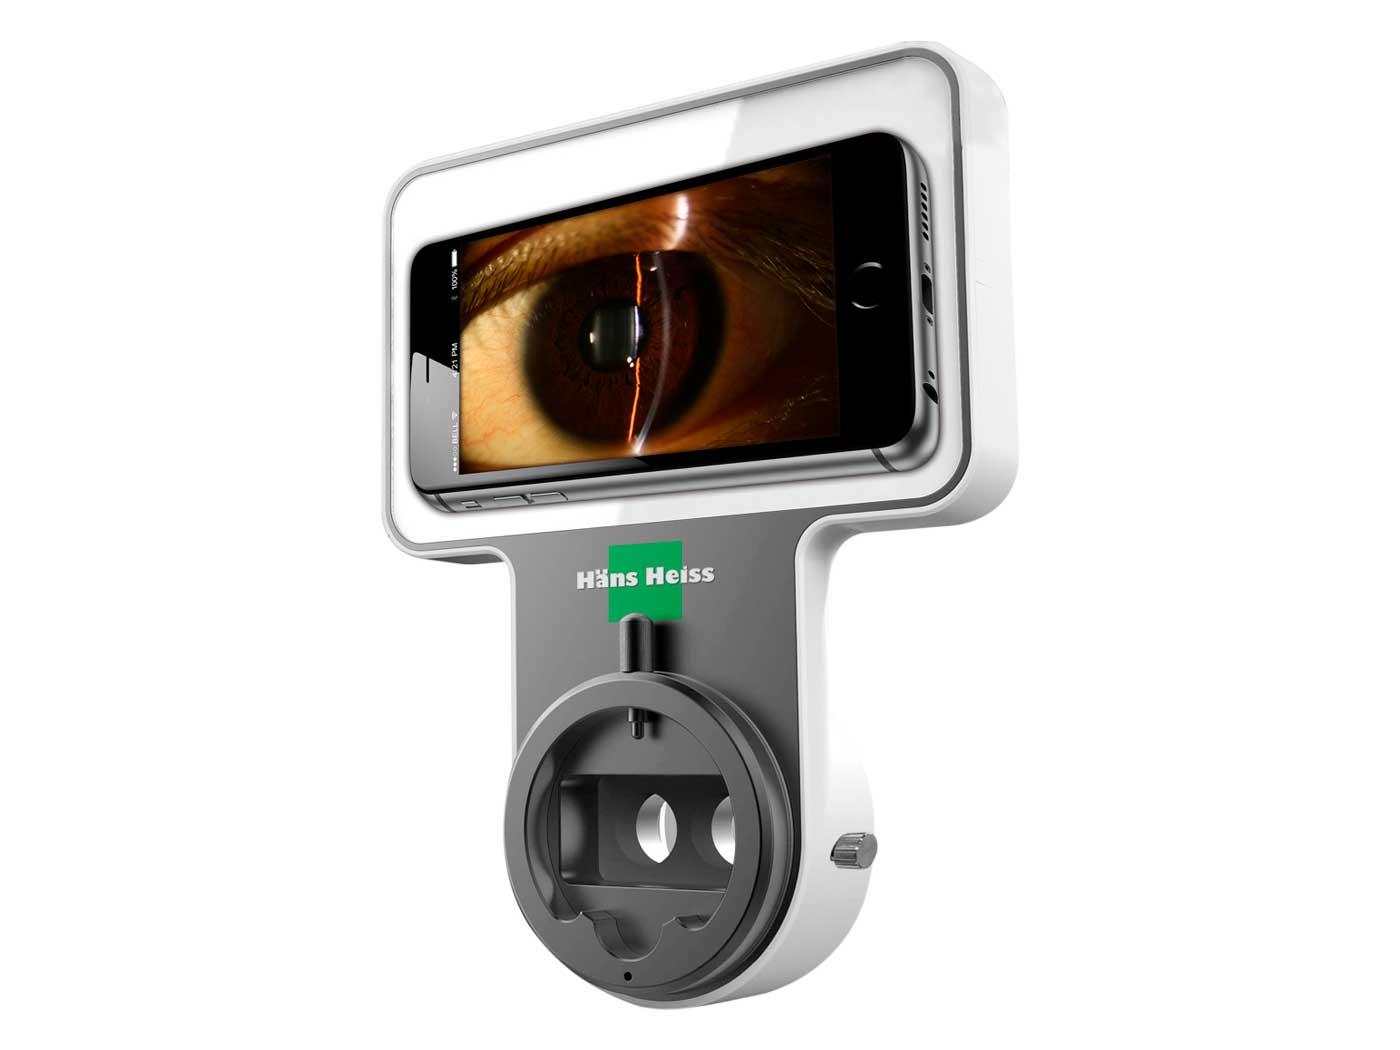 Slit Lamp imaging system HVS-1000